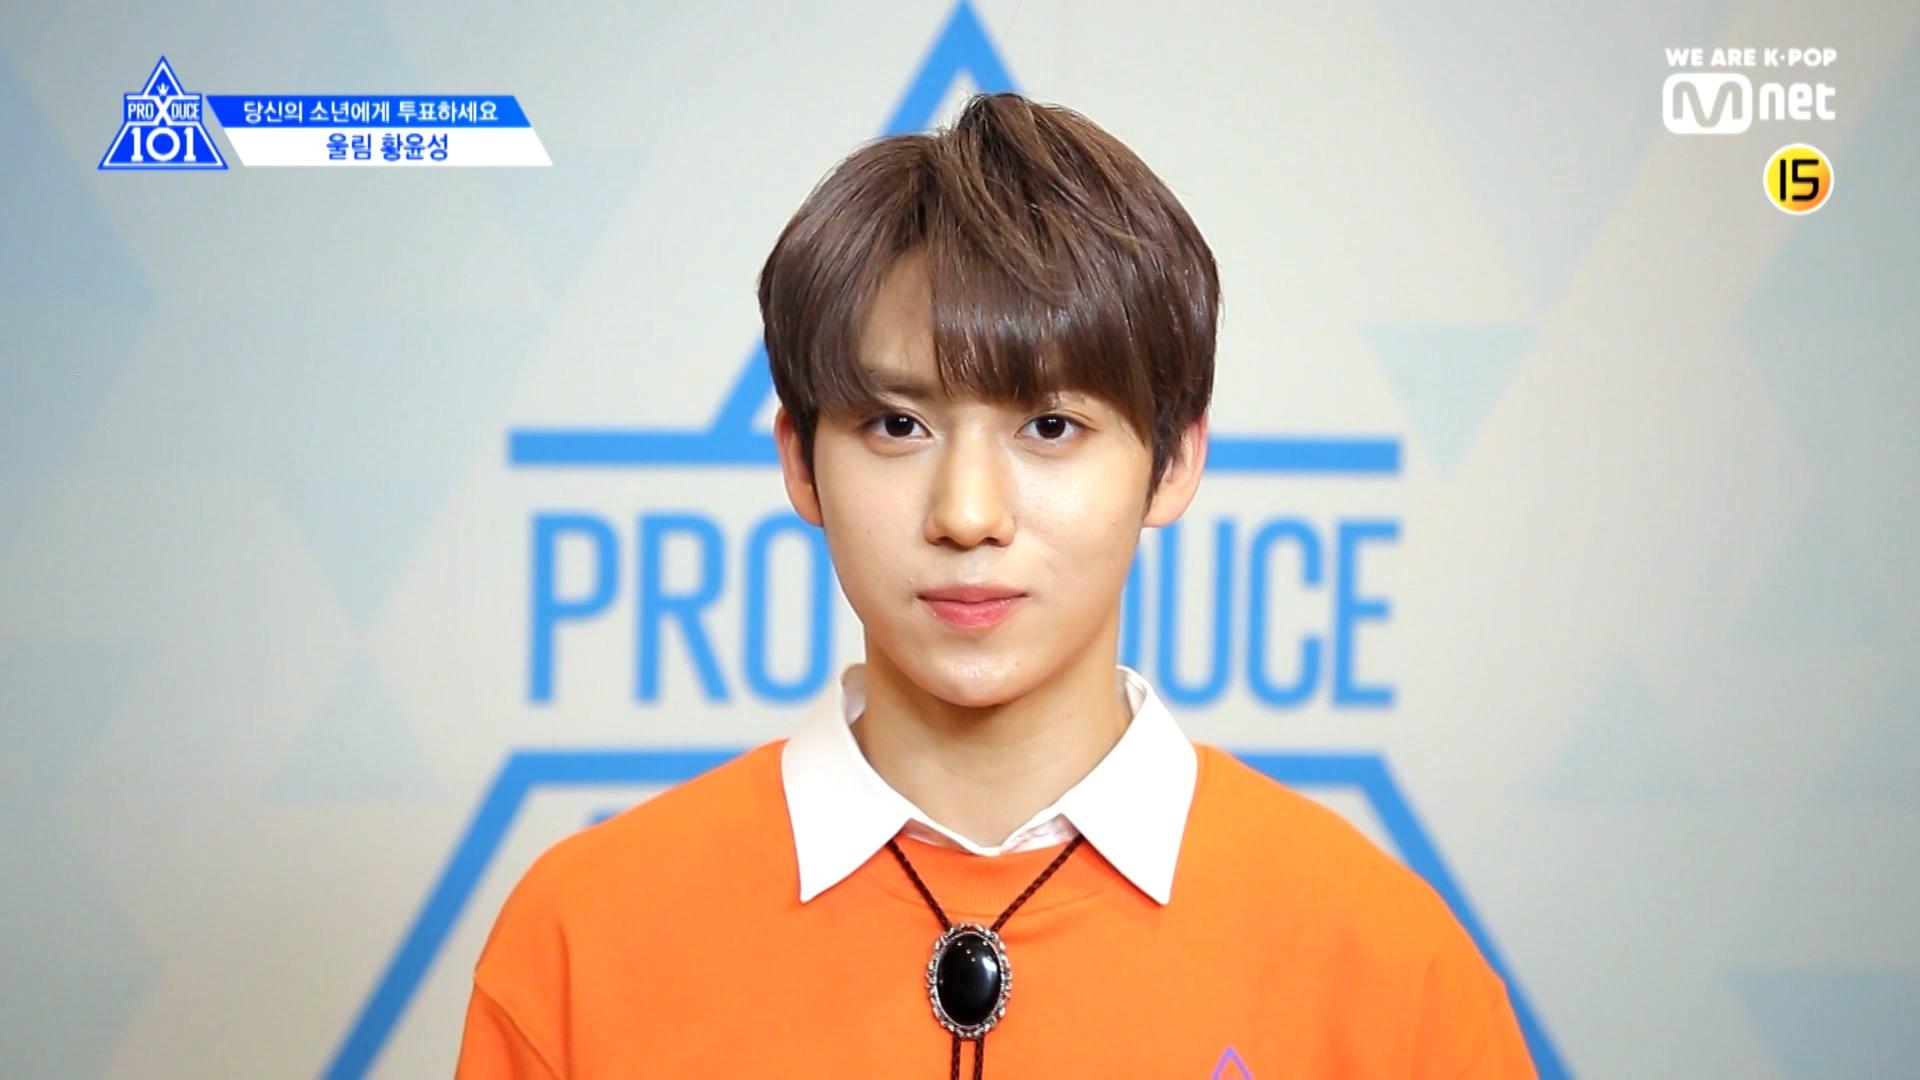 [PRODUCE X 101] EYE CONTACT CHALLENGE l HWANG YUN SEONG(WOOLLIM)